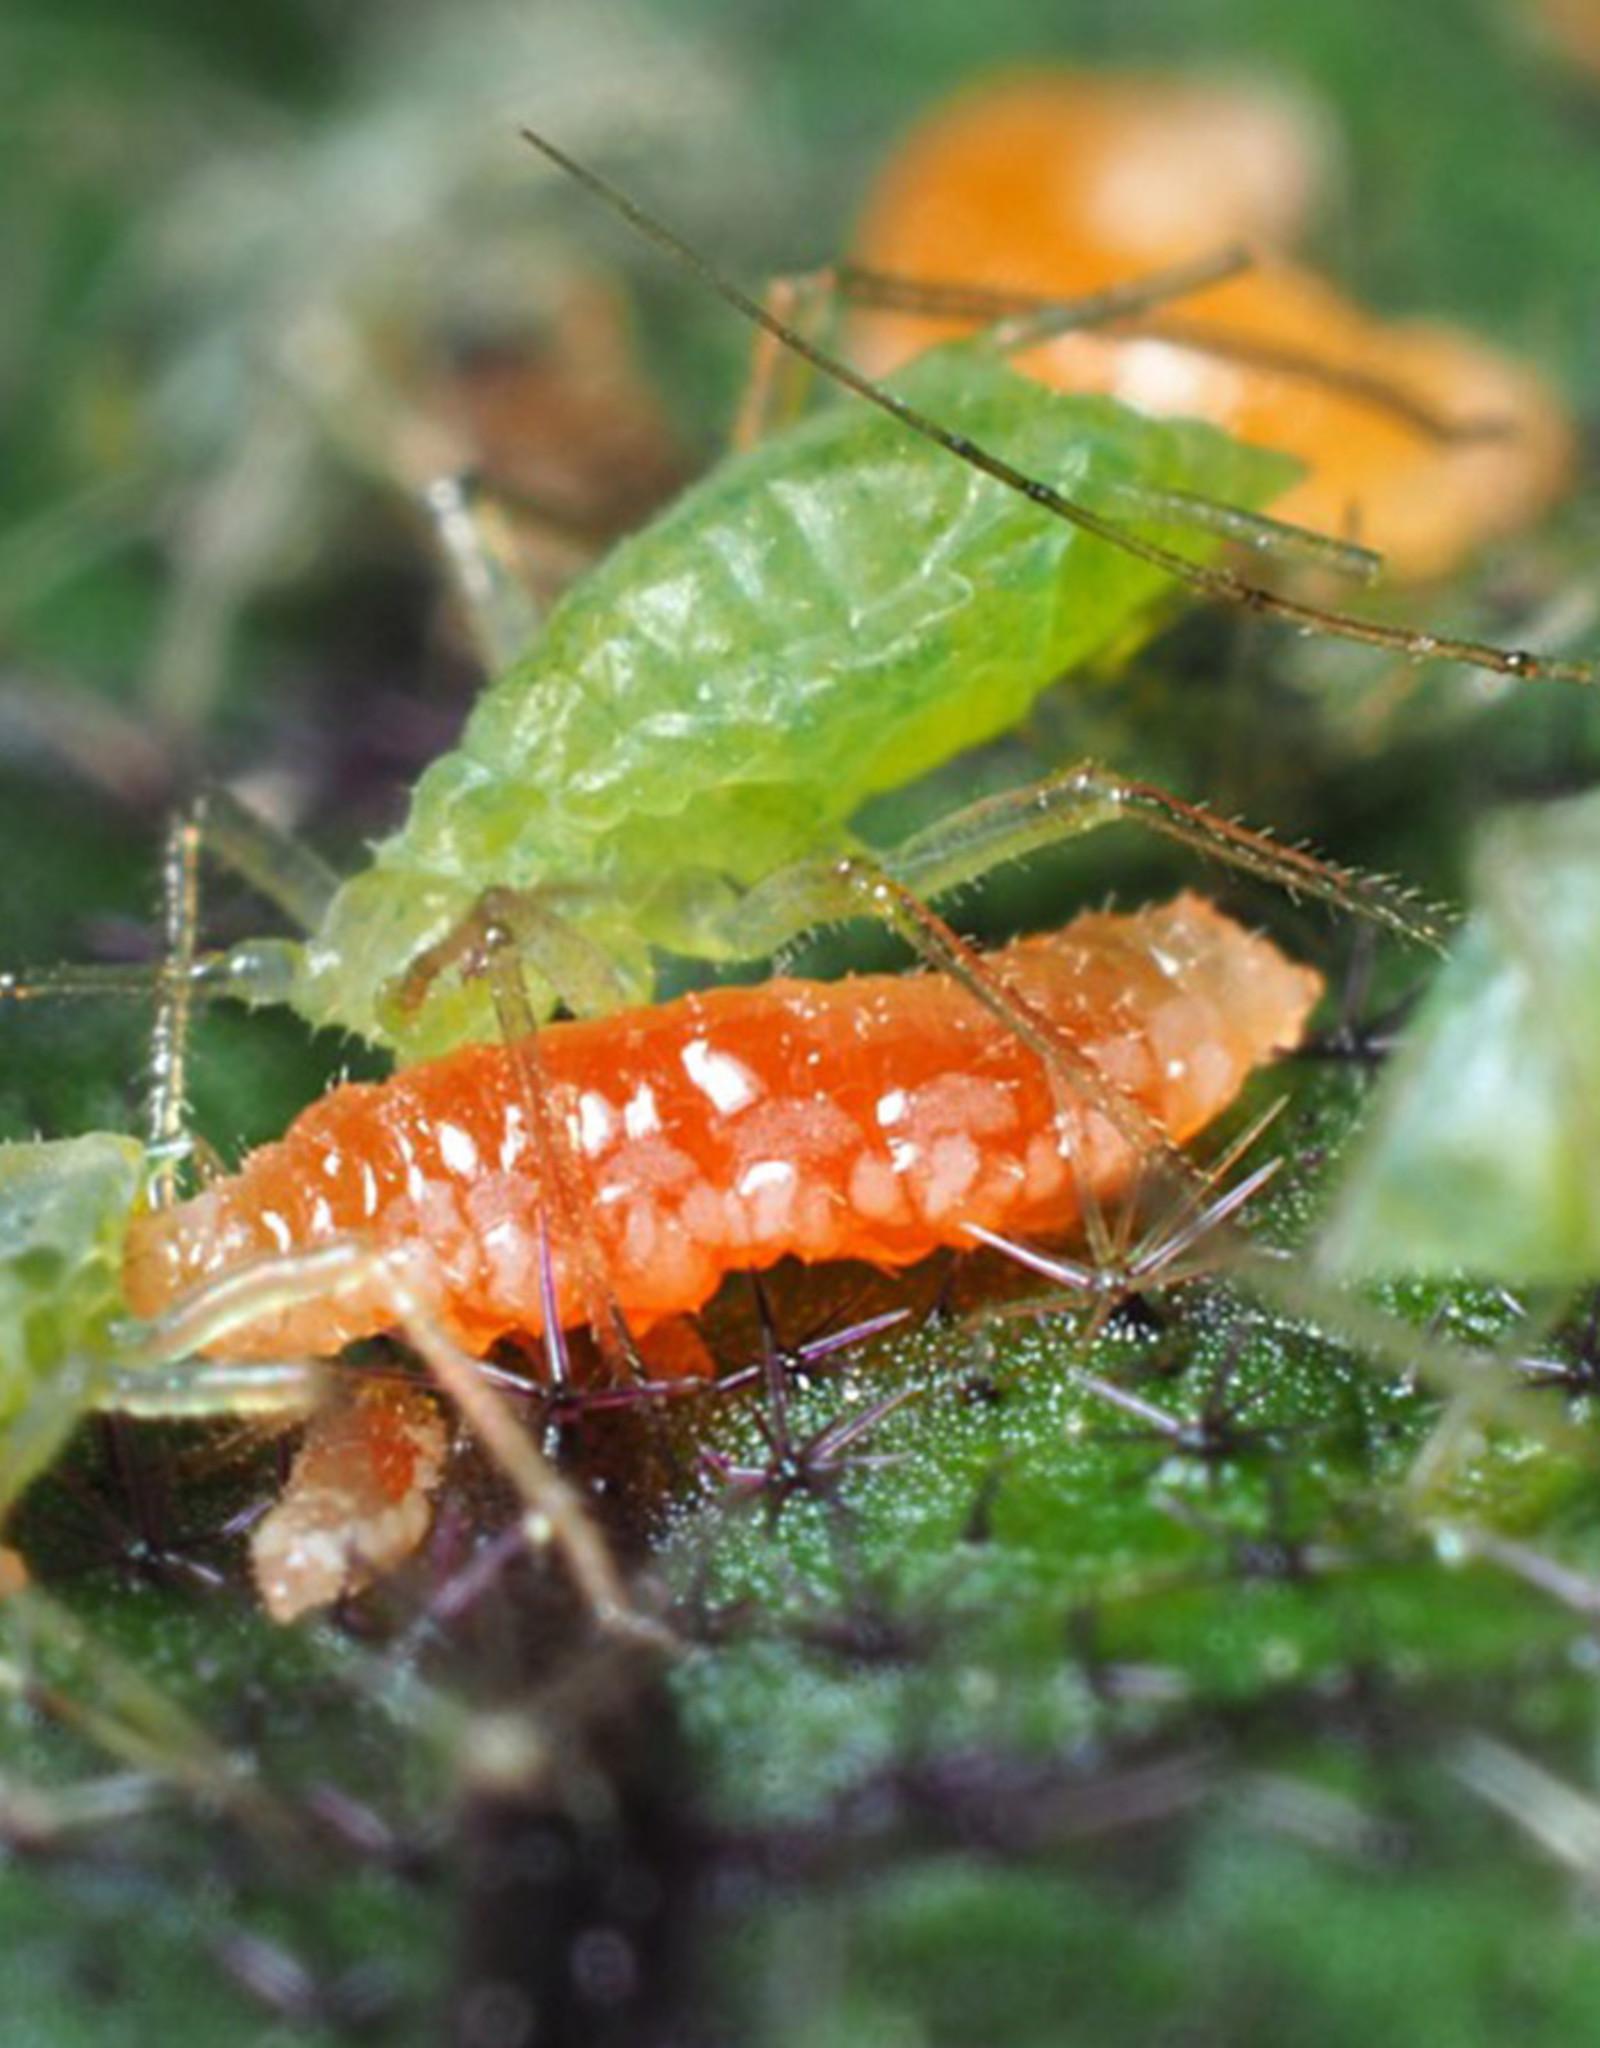 Brimex Biobest Galmug Brimex Aphidoletes aphidimyza Aphidoletes system